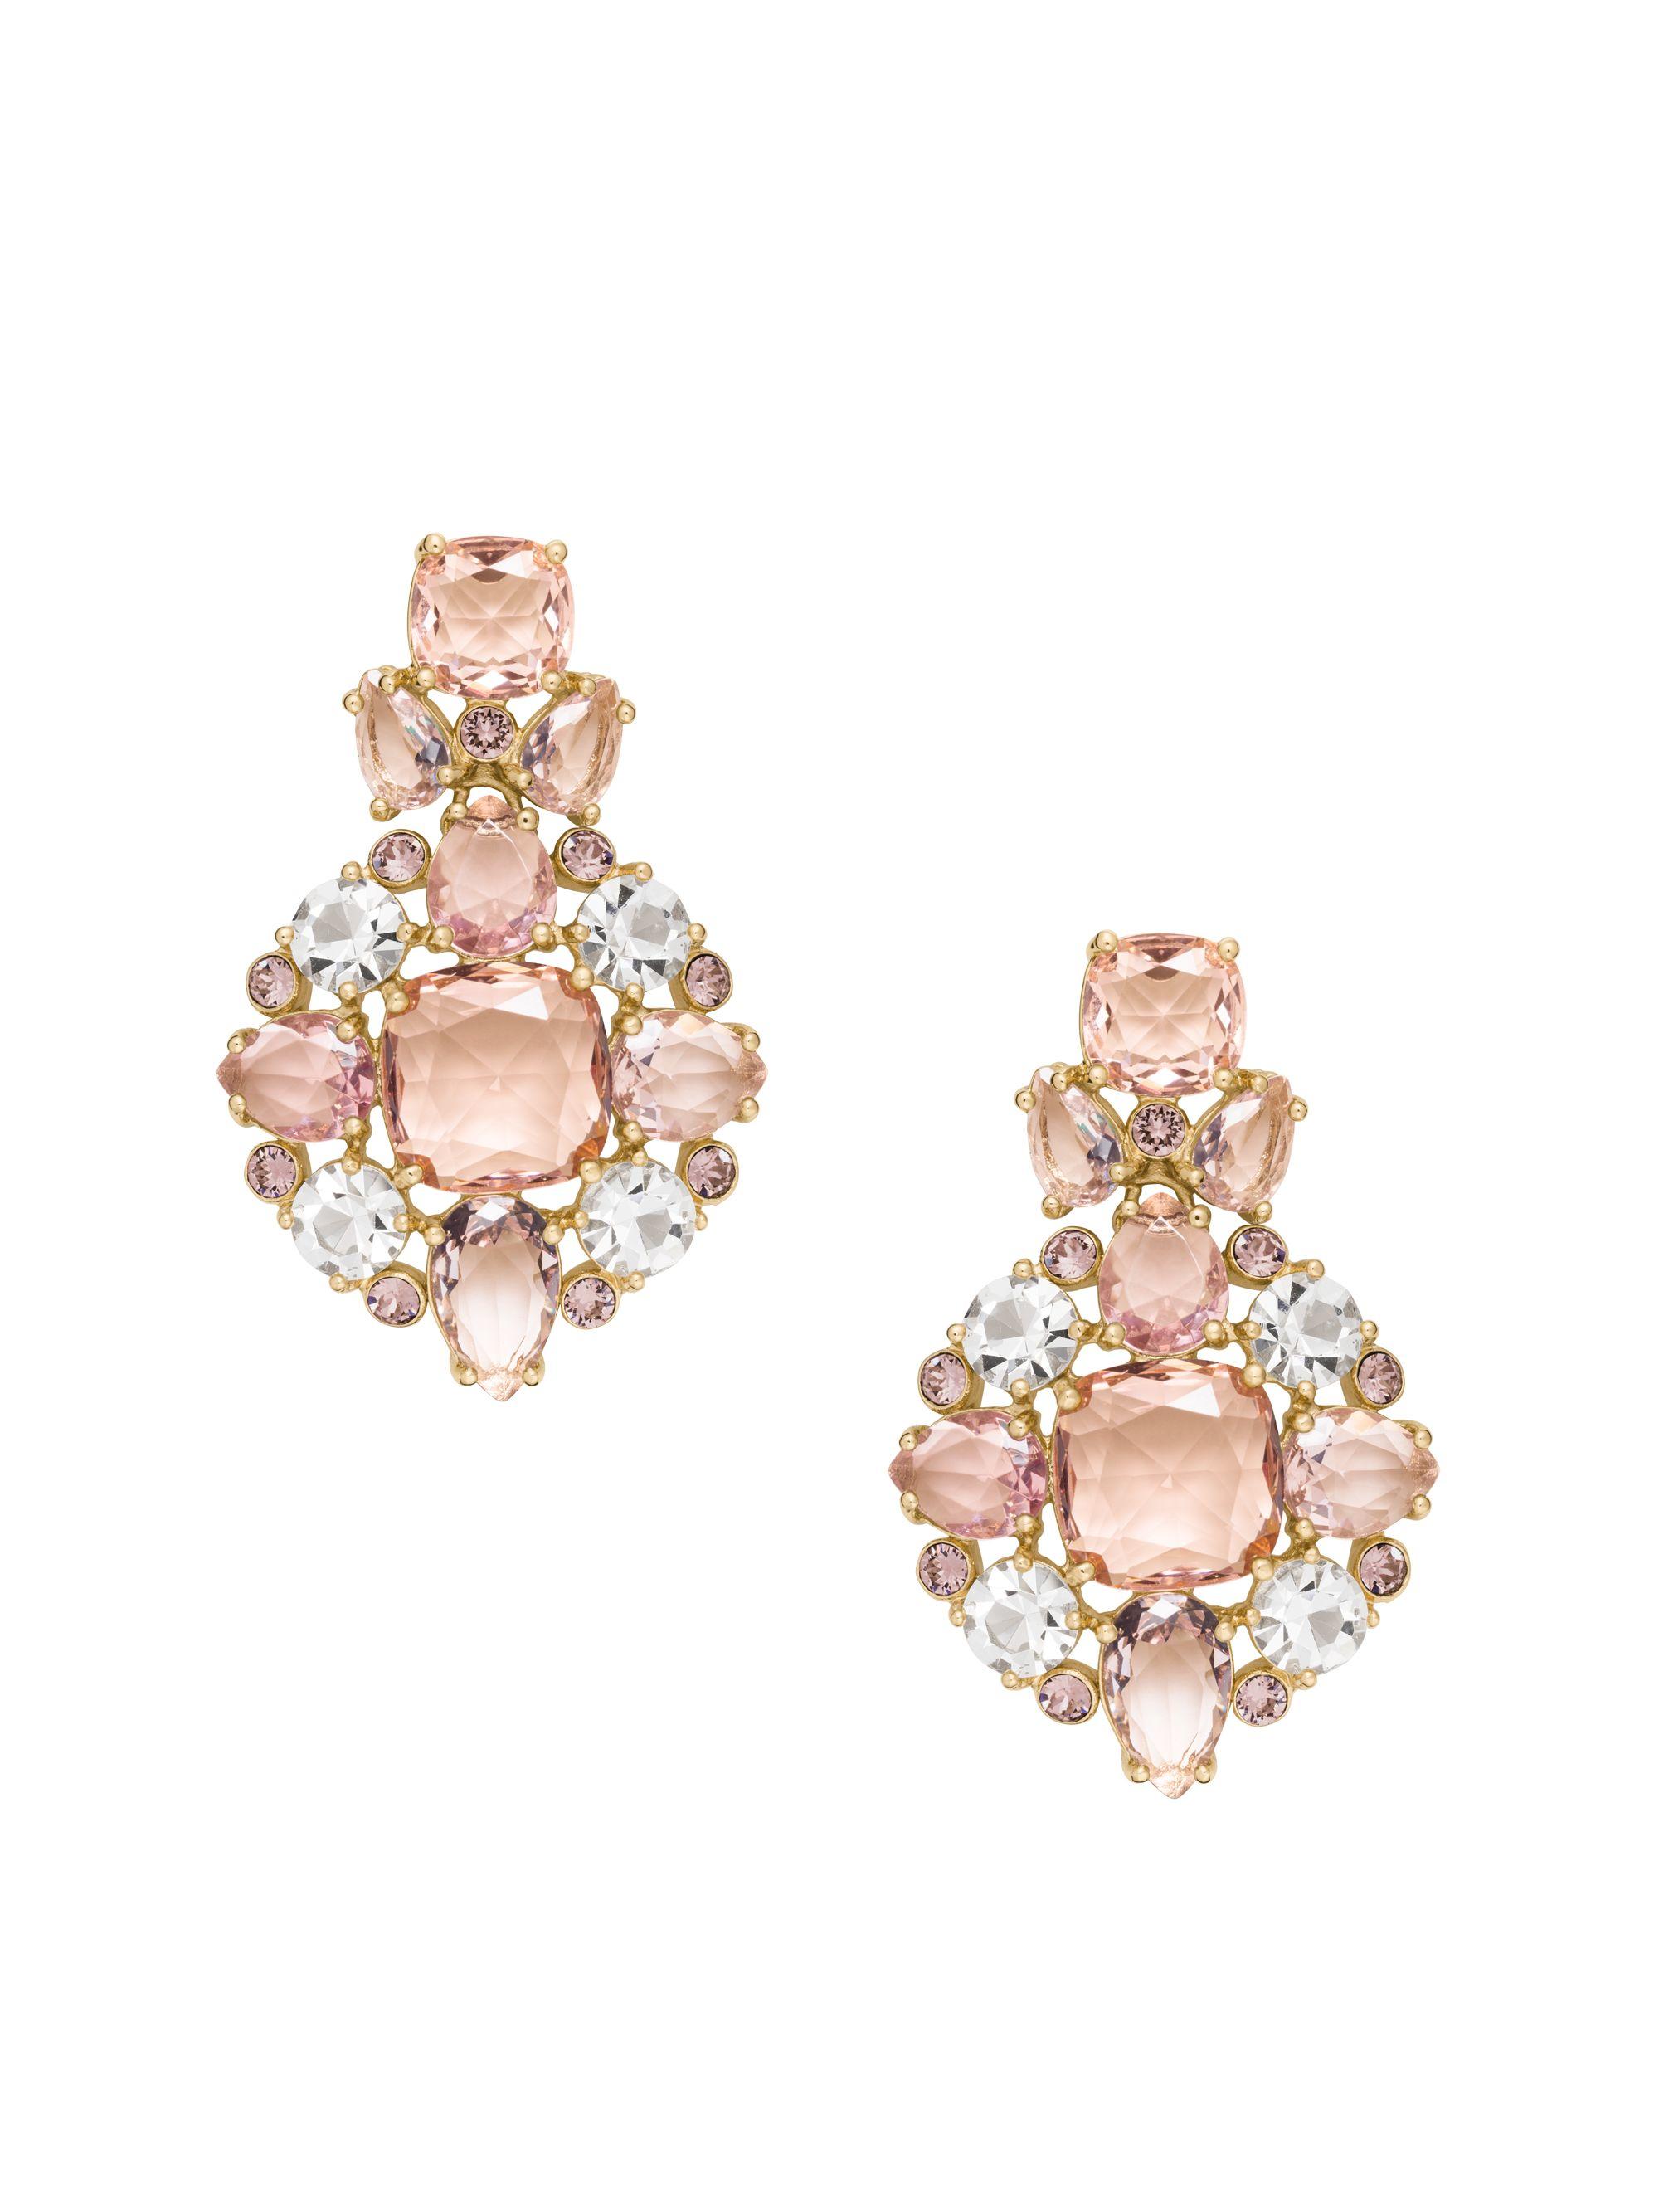 Kate Spade Clip Earrings Www Topsimages Com